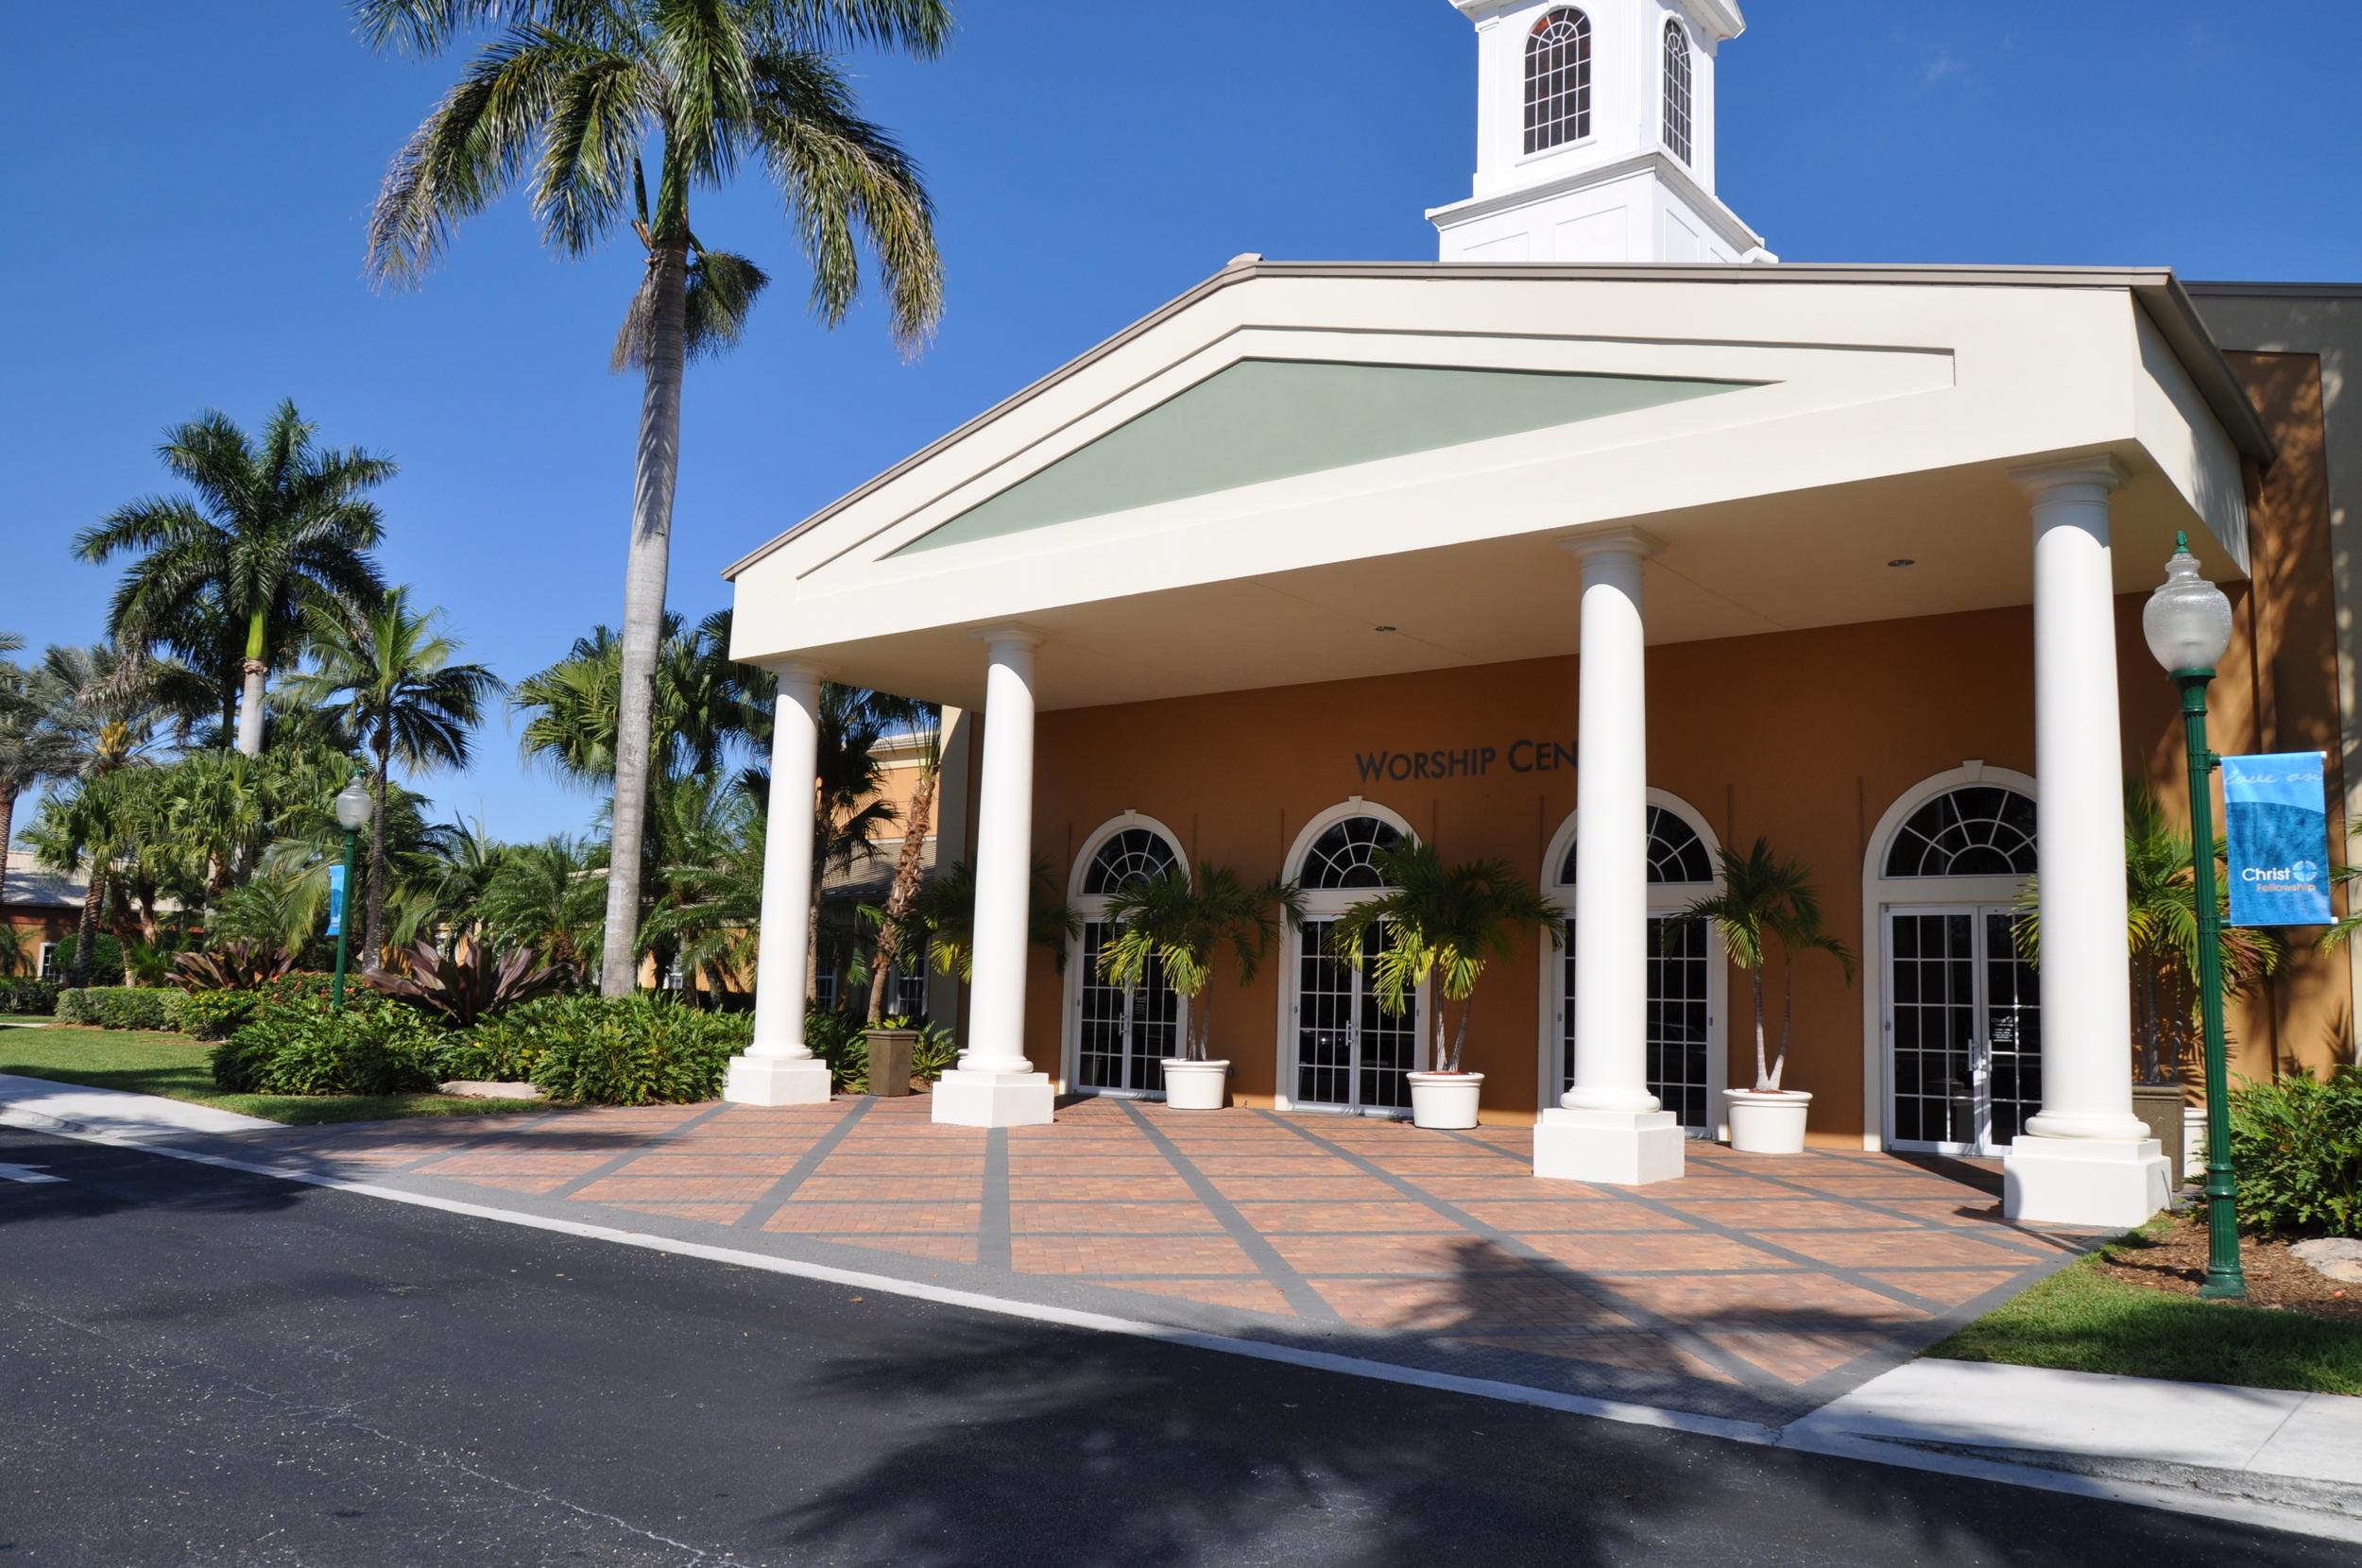 Christ Fellowship Church PBG Worship Center Paving Detail.JPG